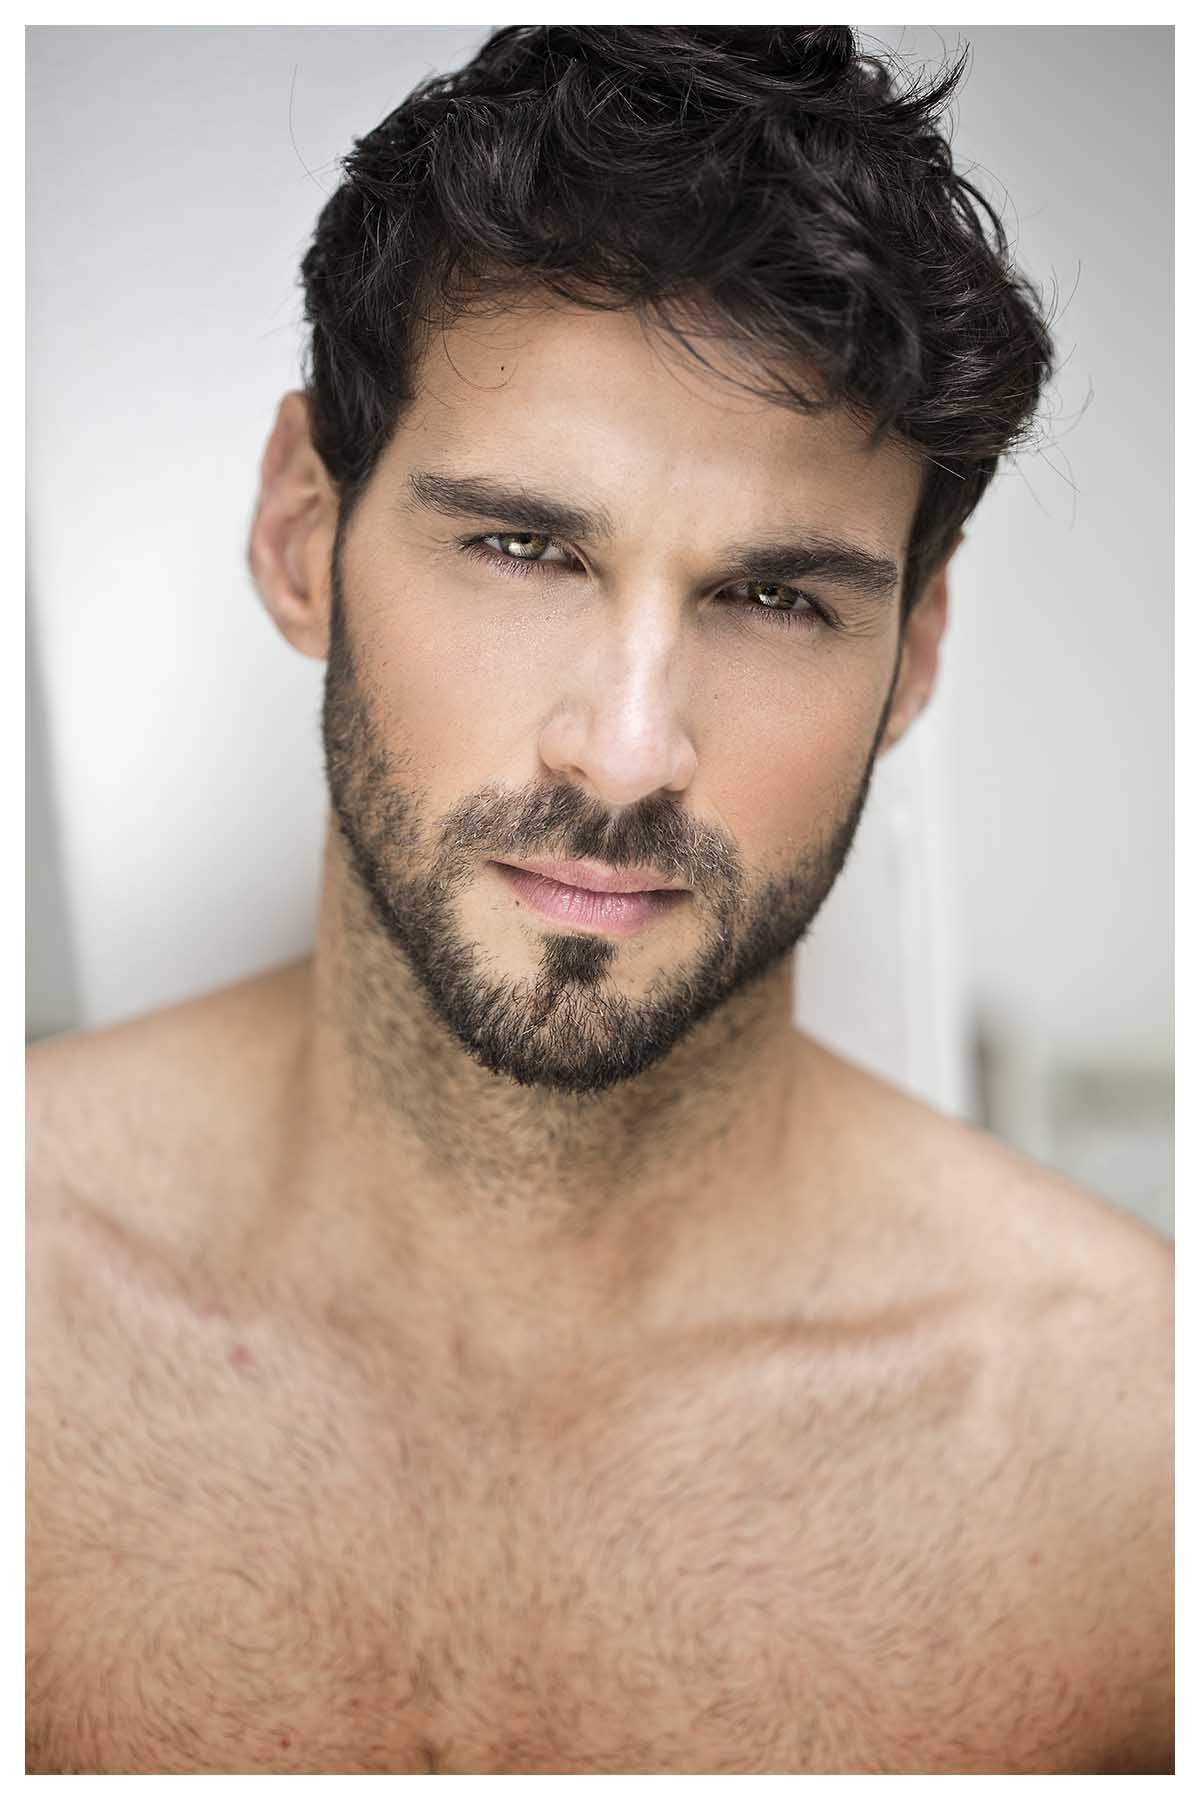 Bruno Coleto by Ronaldo Gutierrez for Brazilian Male Model